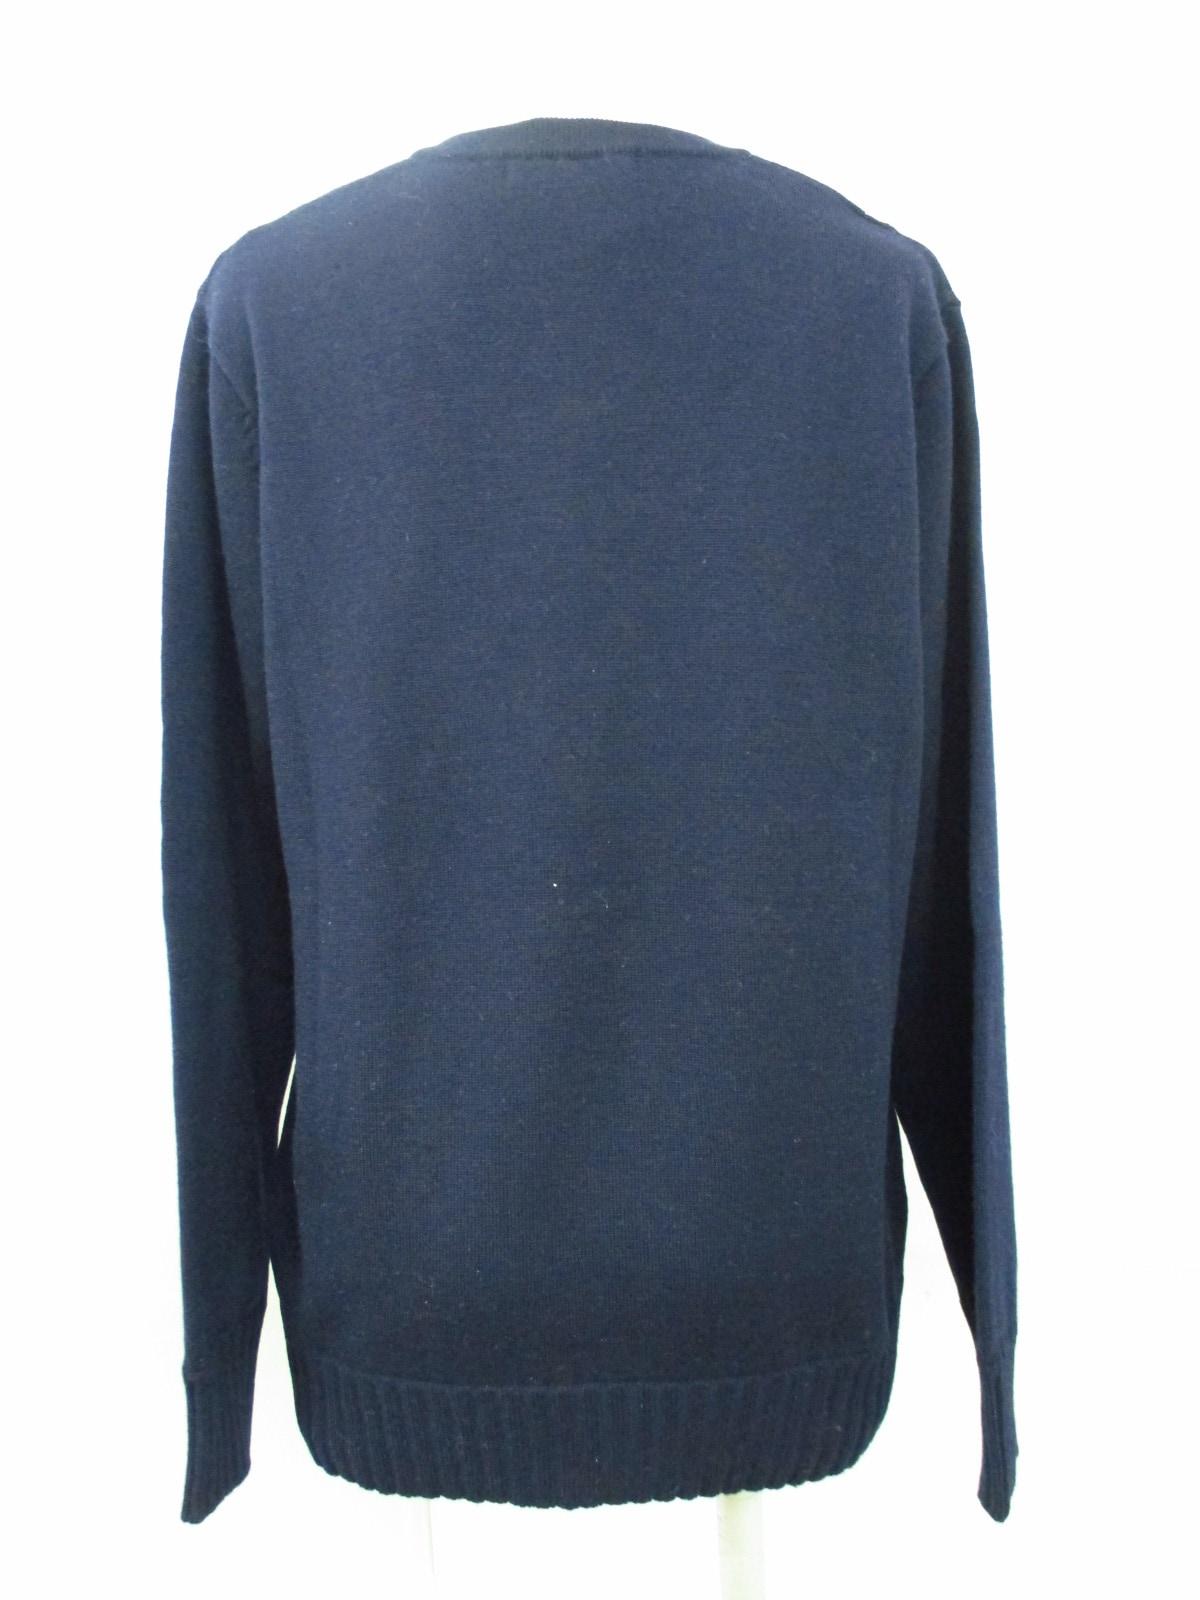 zelal(ゼラール)のセーター